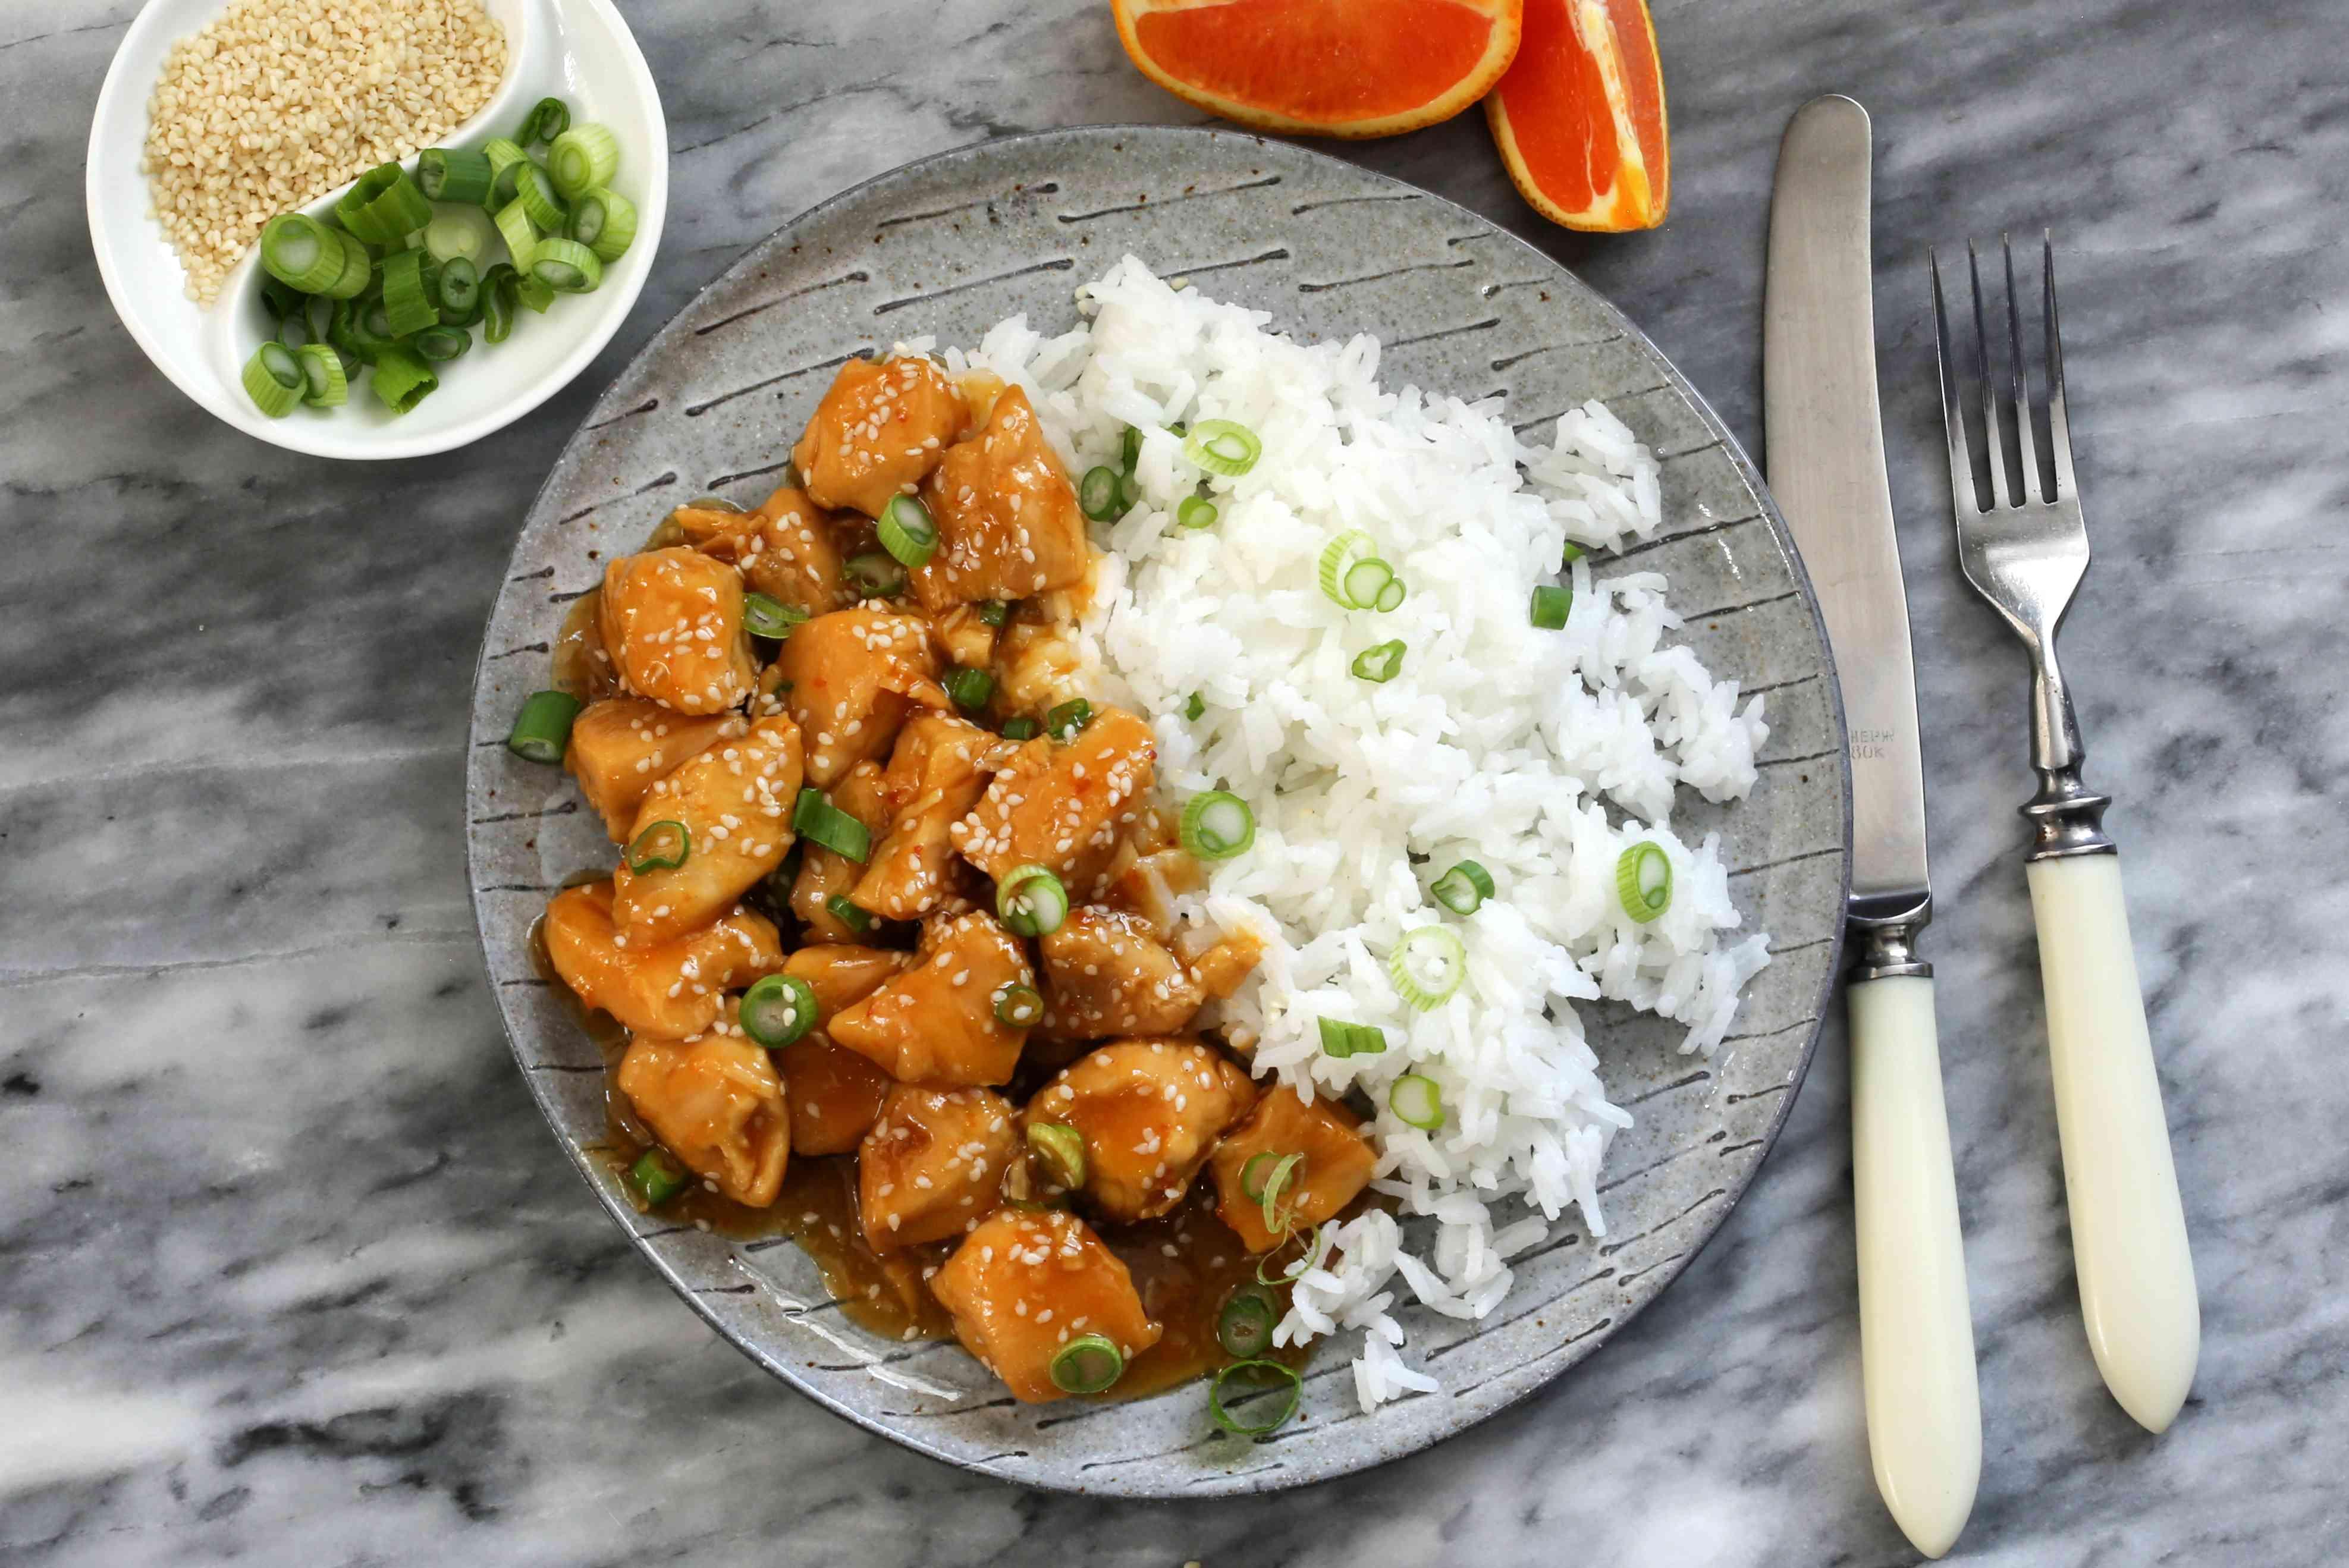 Instant Pot orange chicken with sesame seeds.